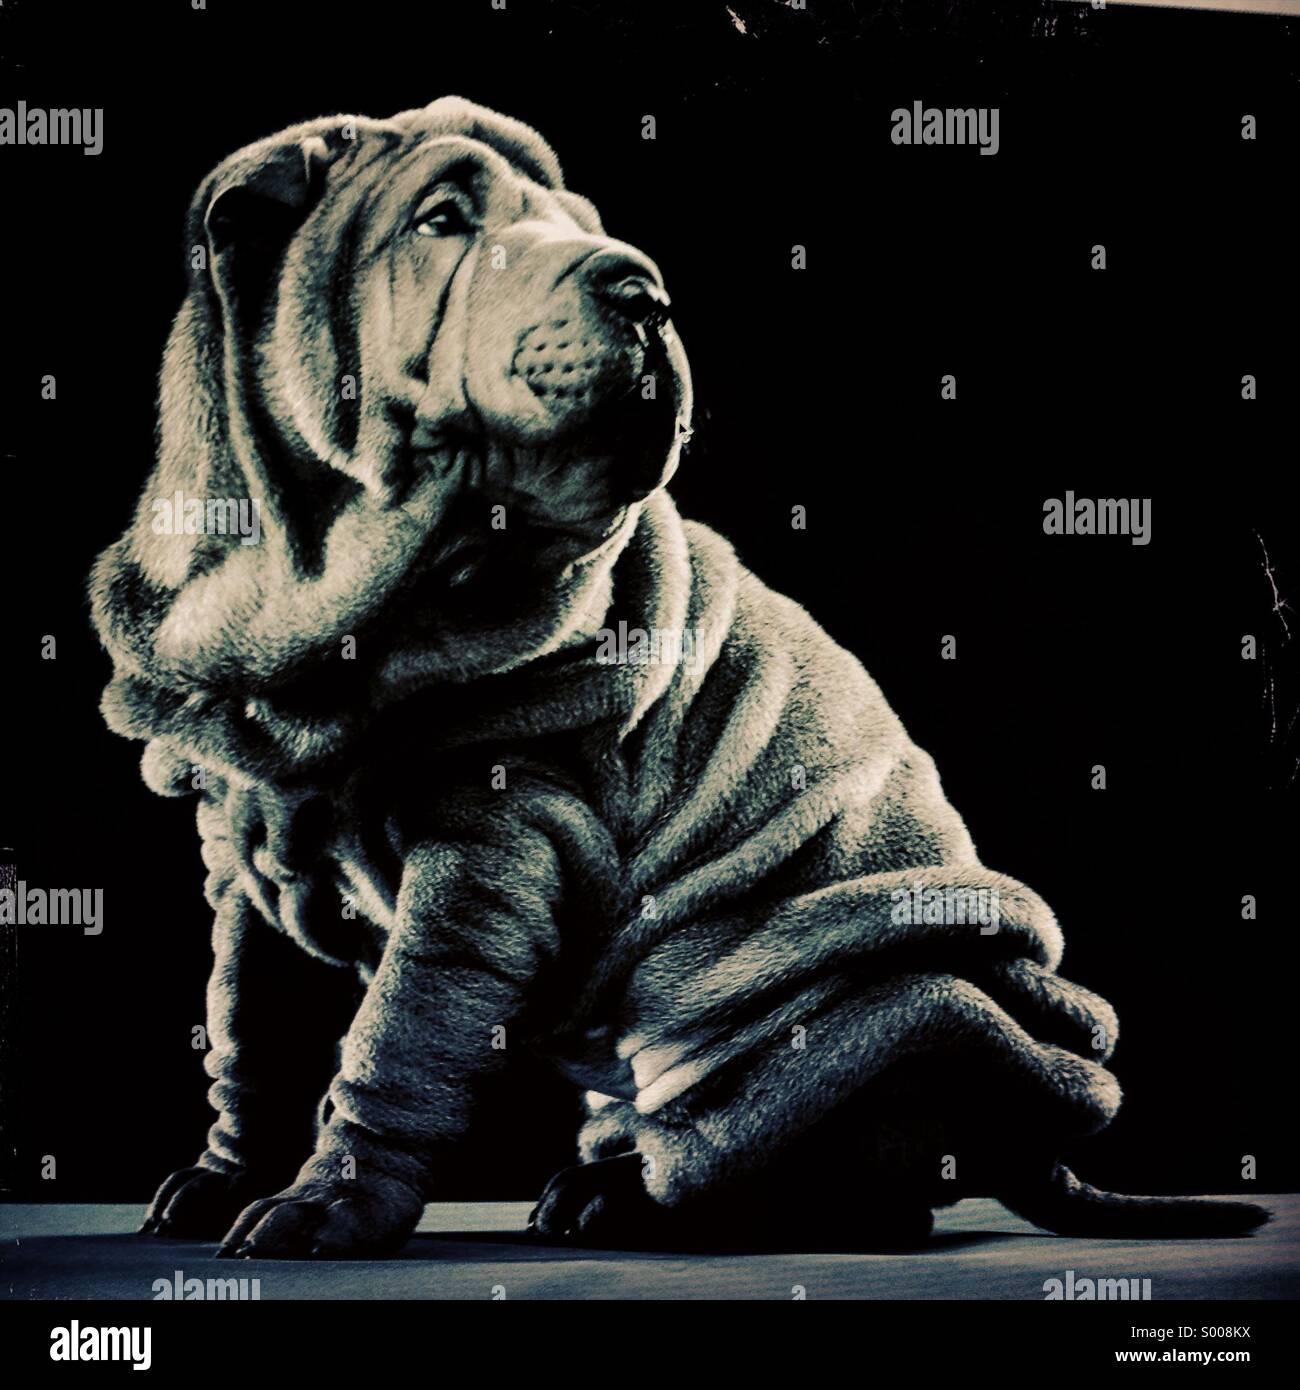 Wrinkly Sharpei shar-pei shar pei puppy - Stock Image